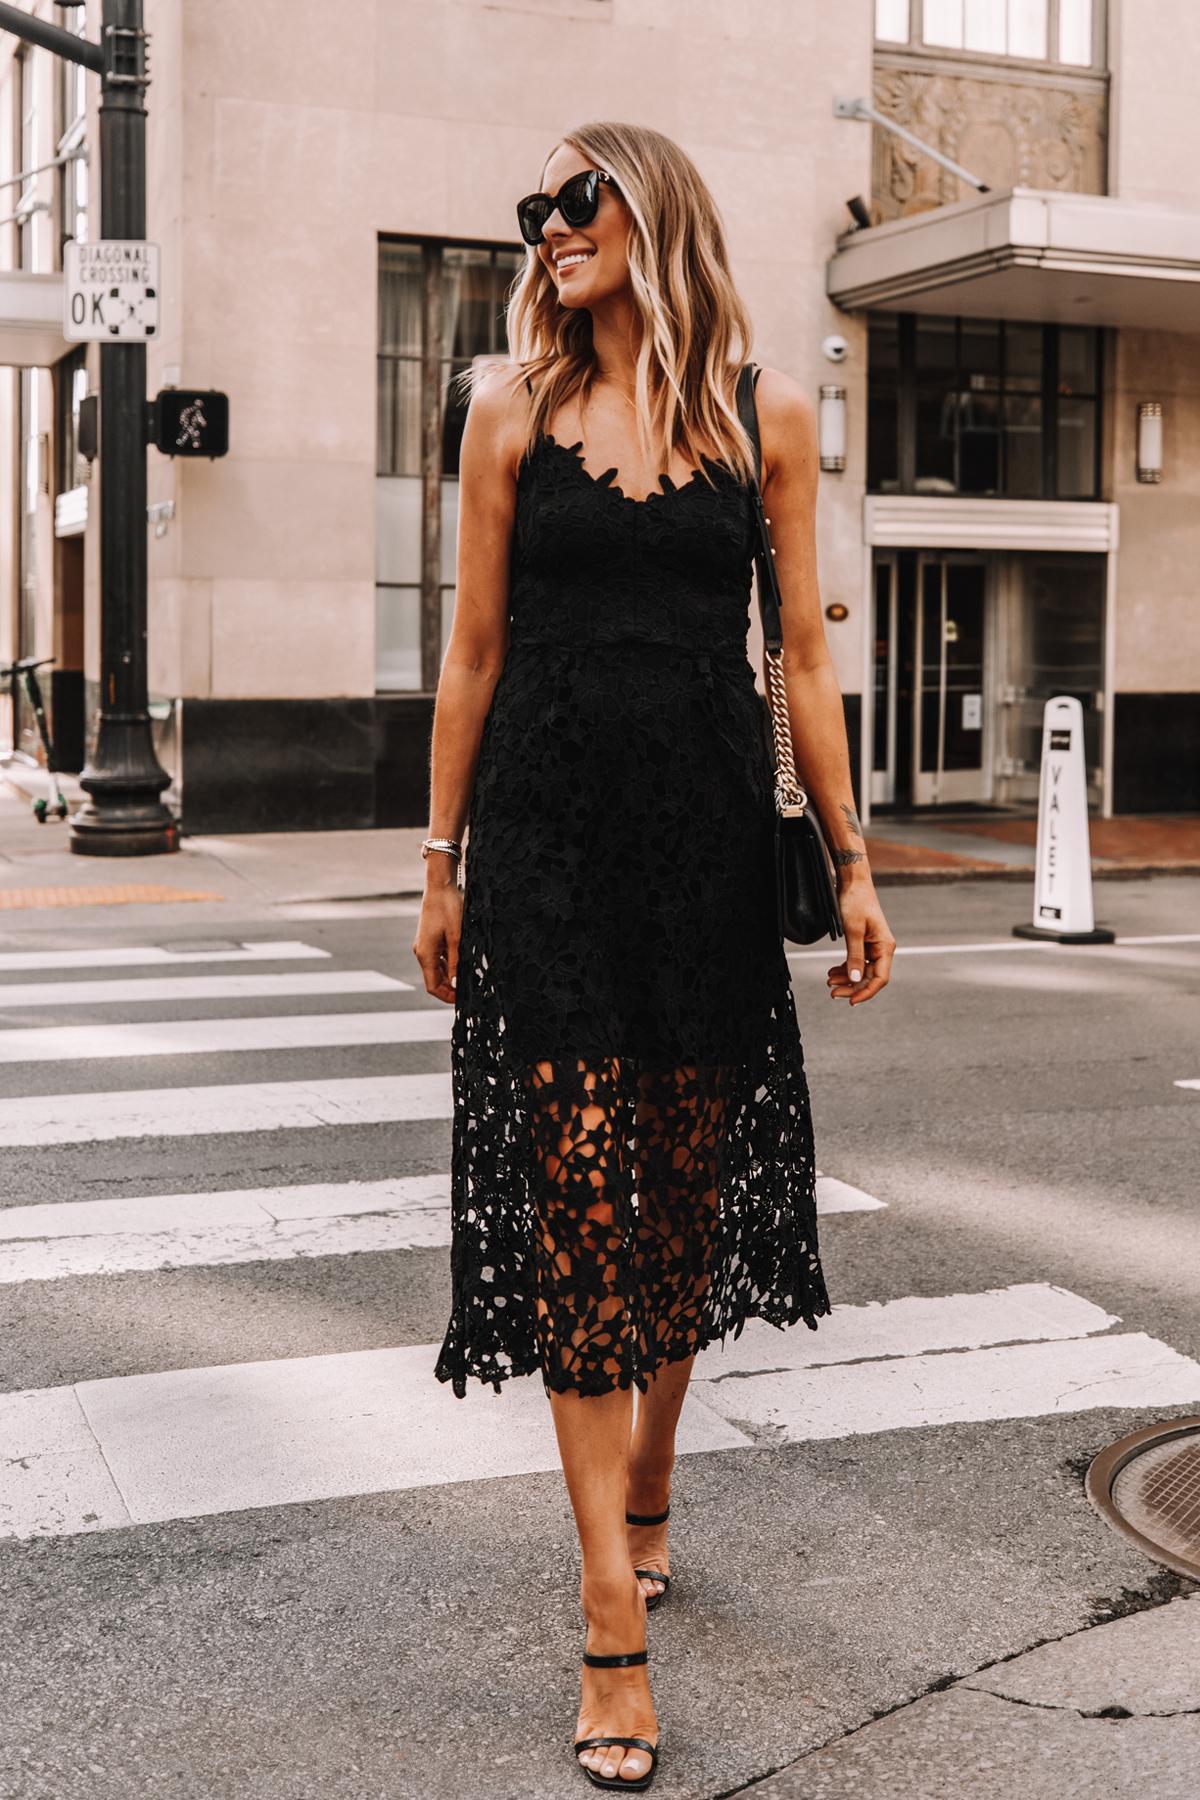 Fashion Jackson Wearing Black Lace Midi Dress Black Heeled Sandals Cocktail Dress 1